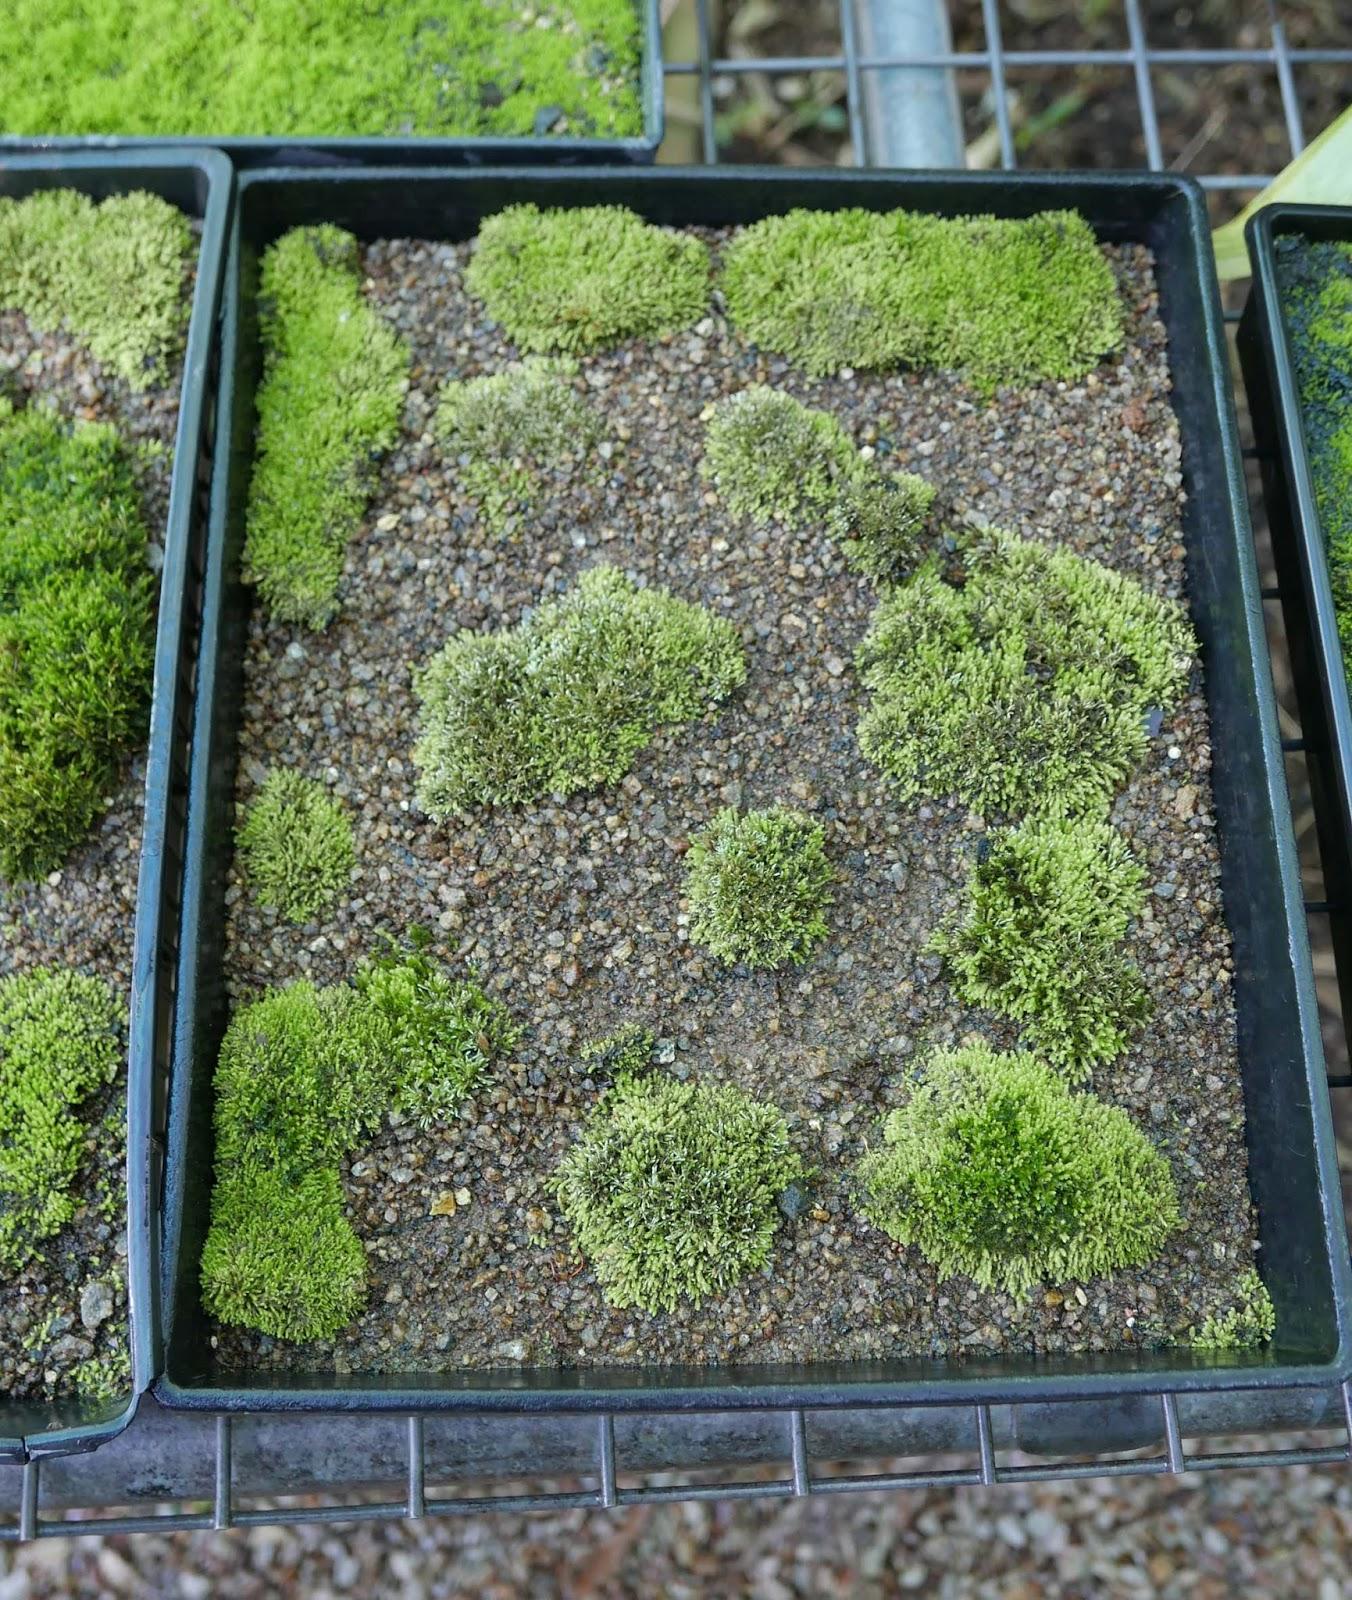 Stephen Cullum S Bonsai Pottery Post 237 Growing Moss The